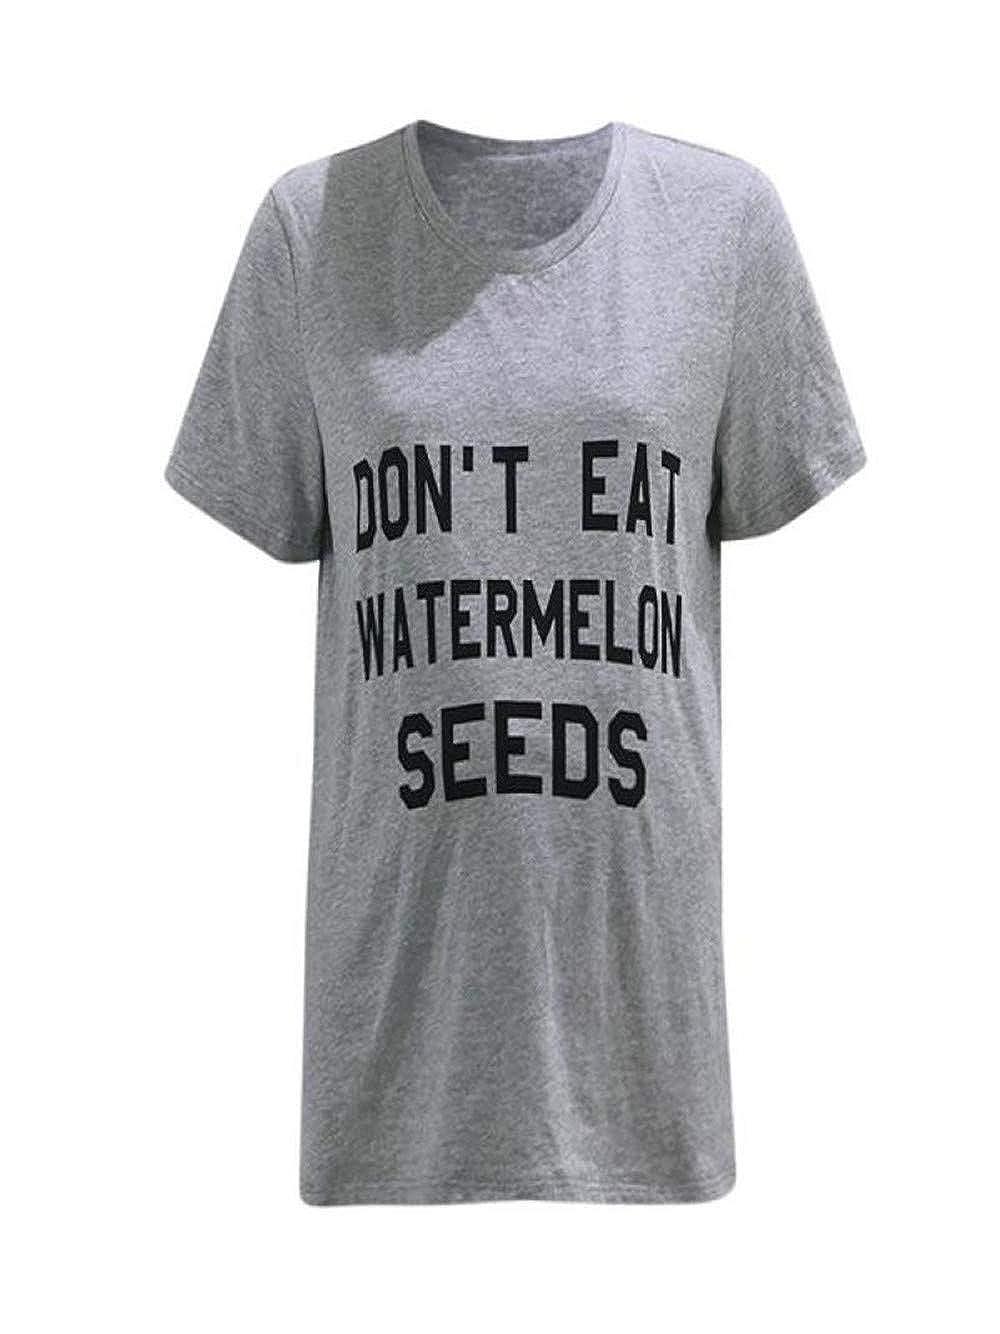 01106070883aa LILICAT Maternity Don't eat Watermelon Seeds Funny Food Pregnancy Shirt  Women Maternity Nursing Vest Top Letter Print Pregnant Breastfeeding Tank  Tops ...